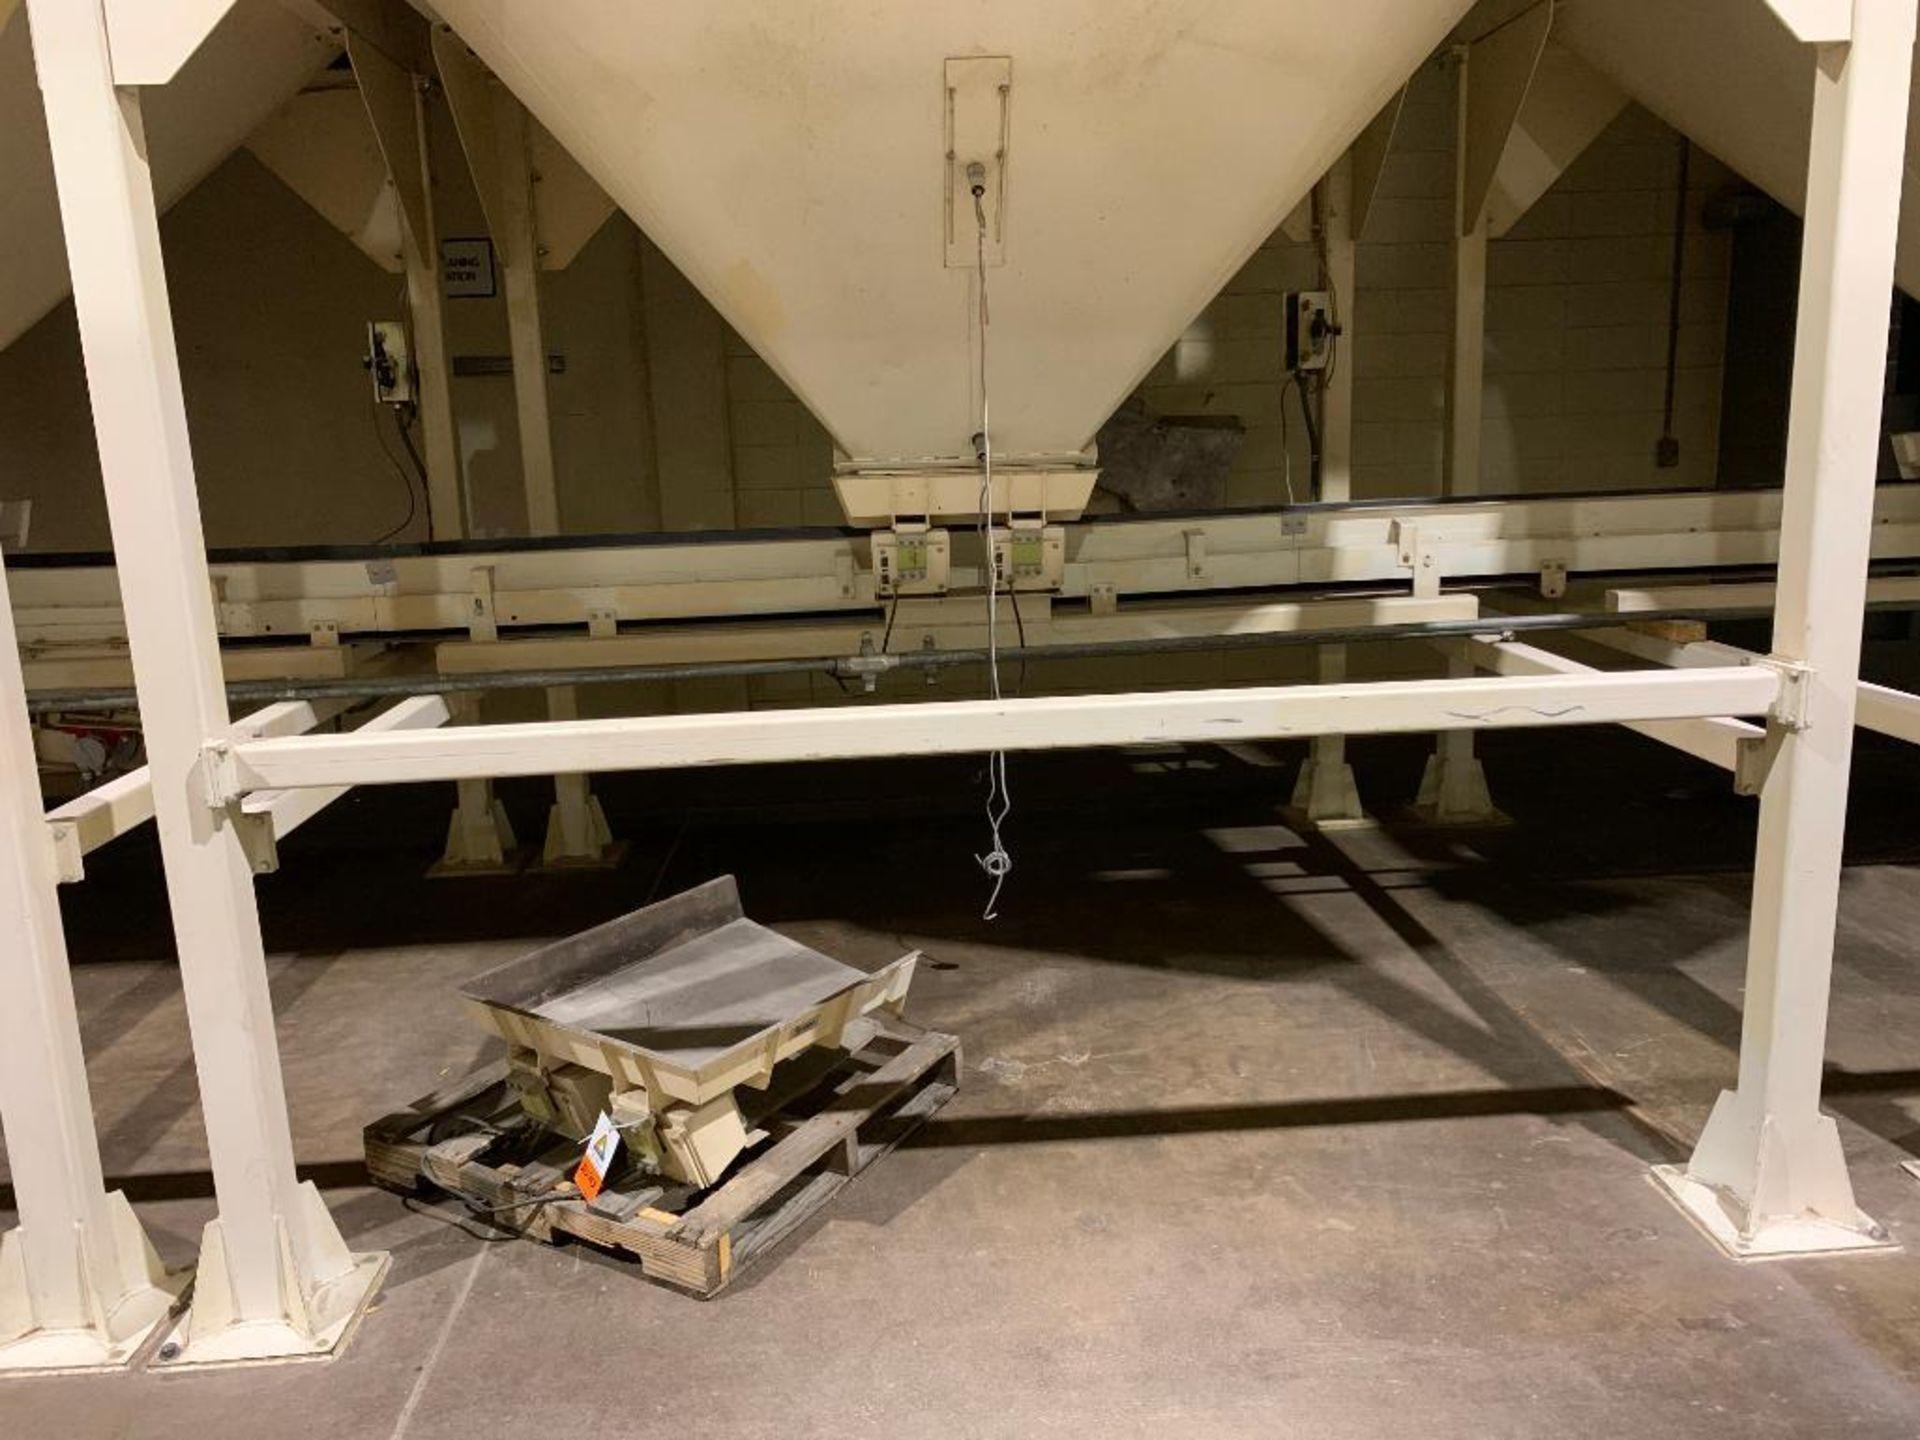 Aseeco mild steel cone bottom bulk storage bin - Image 3 of 23